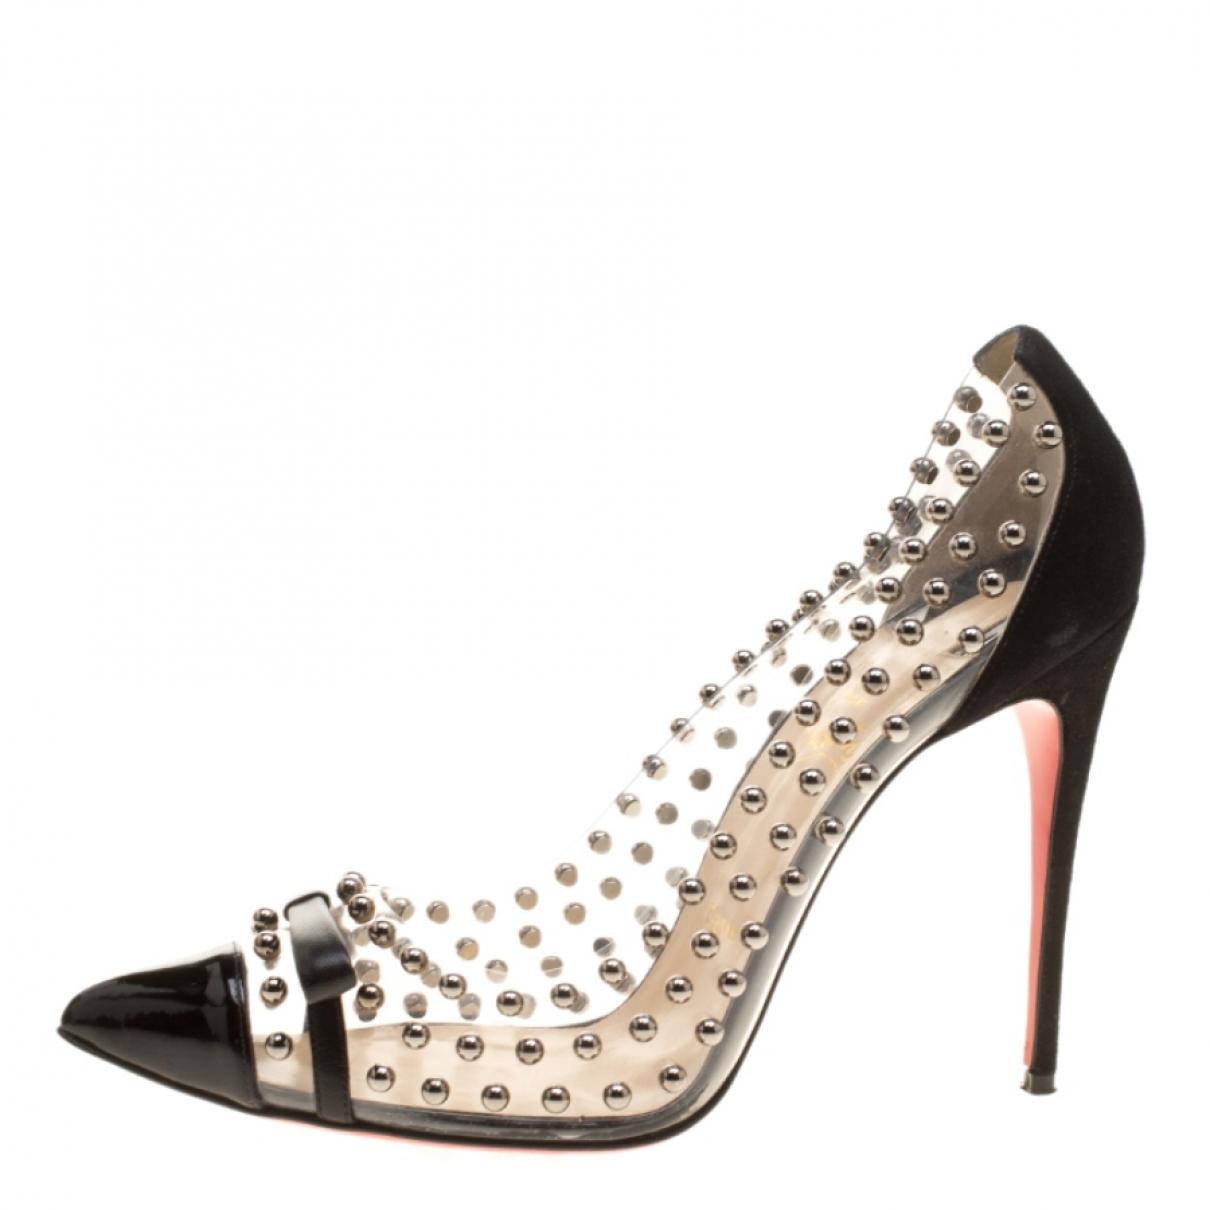 Christian Louboutin N Black Suede Heels for Women 9.5 US